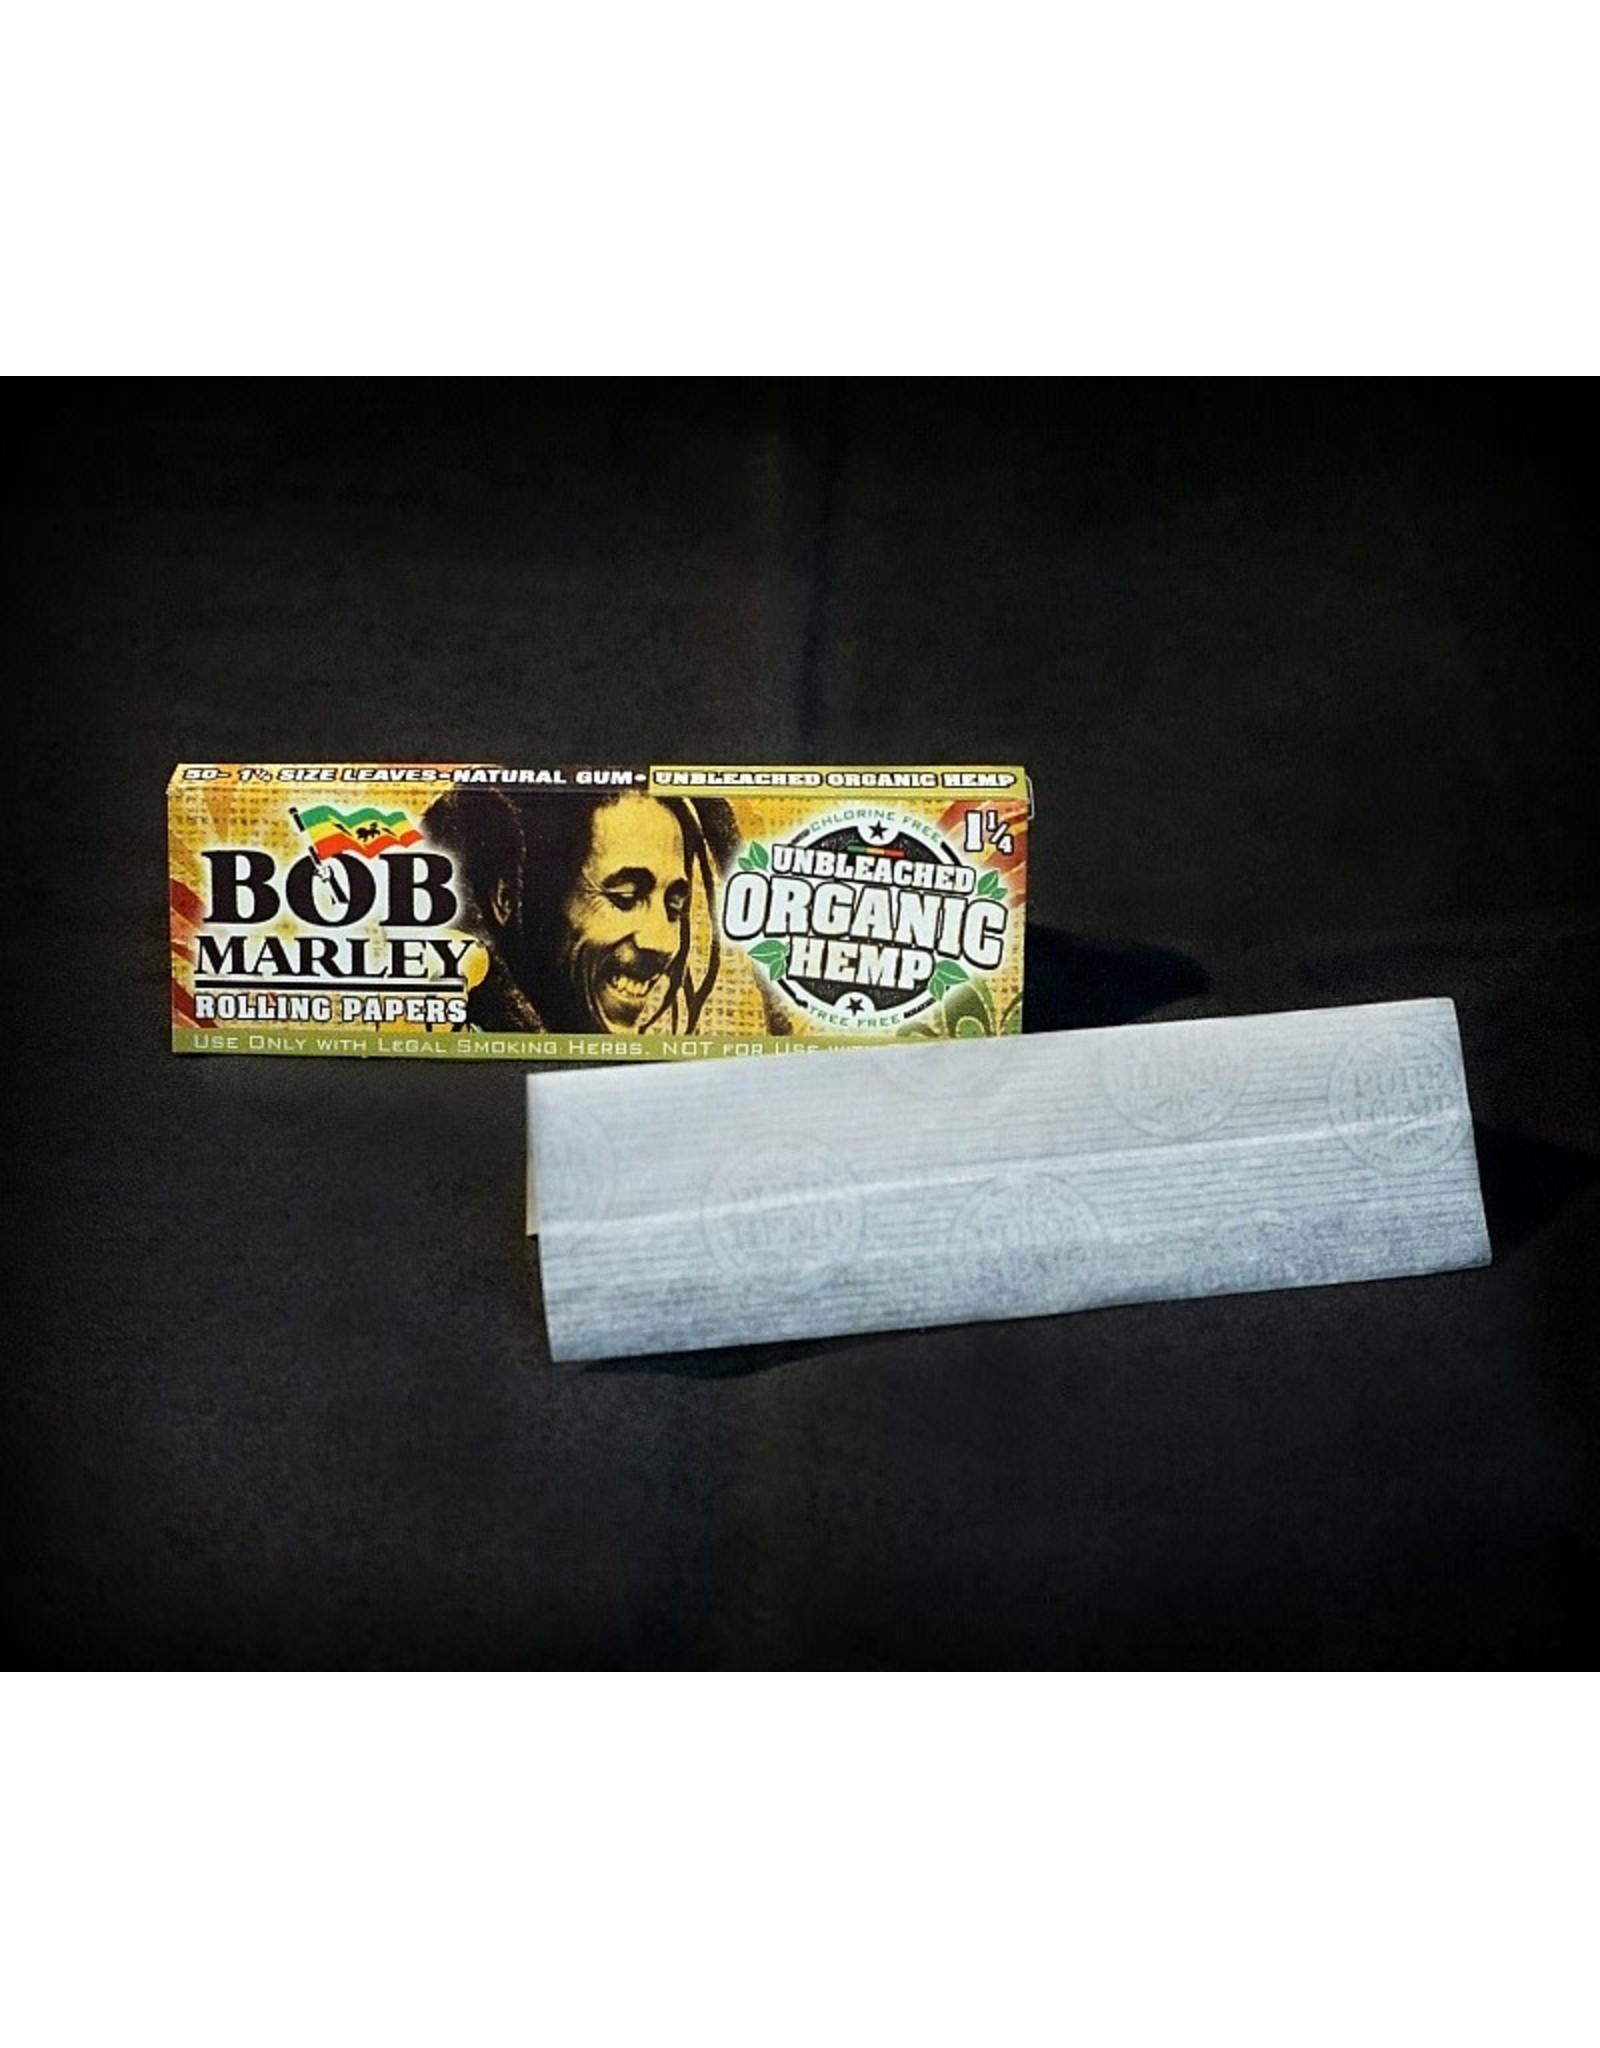 Bob Marley Papers Bob Marley Papers 1.25 Organic